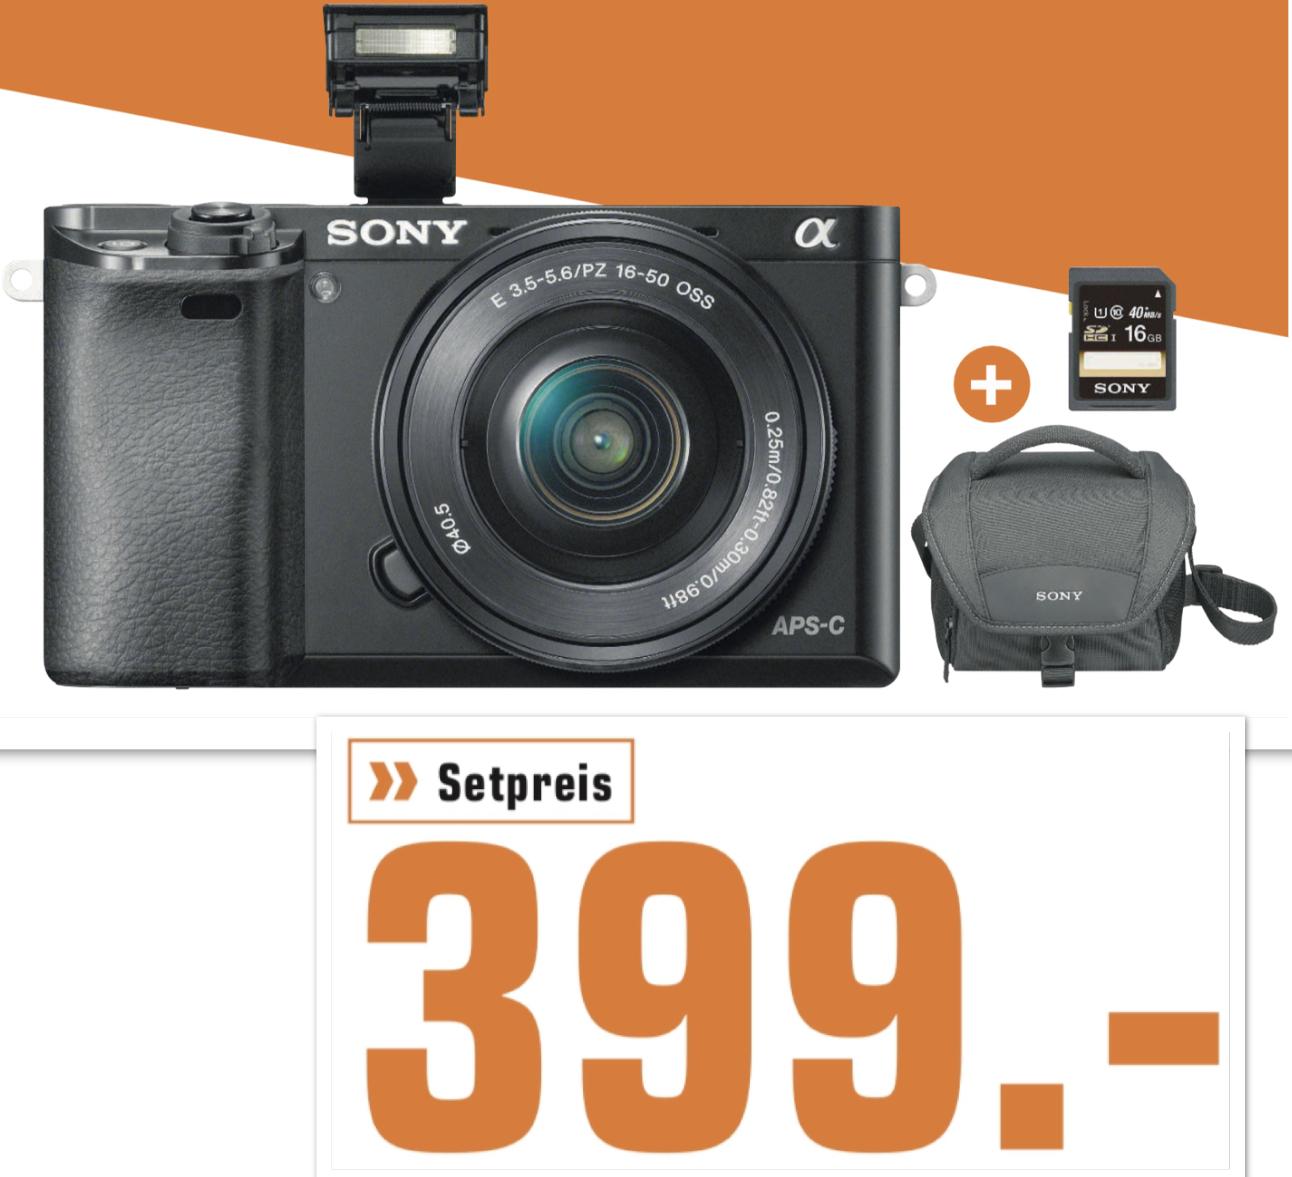 Lokal Saturn Osnabrück: Sony Alpha 6000 L Kit 16-50mm + Sony Bag Black Tasche + Speicherkarte für 399€